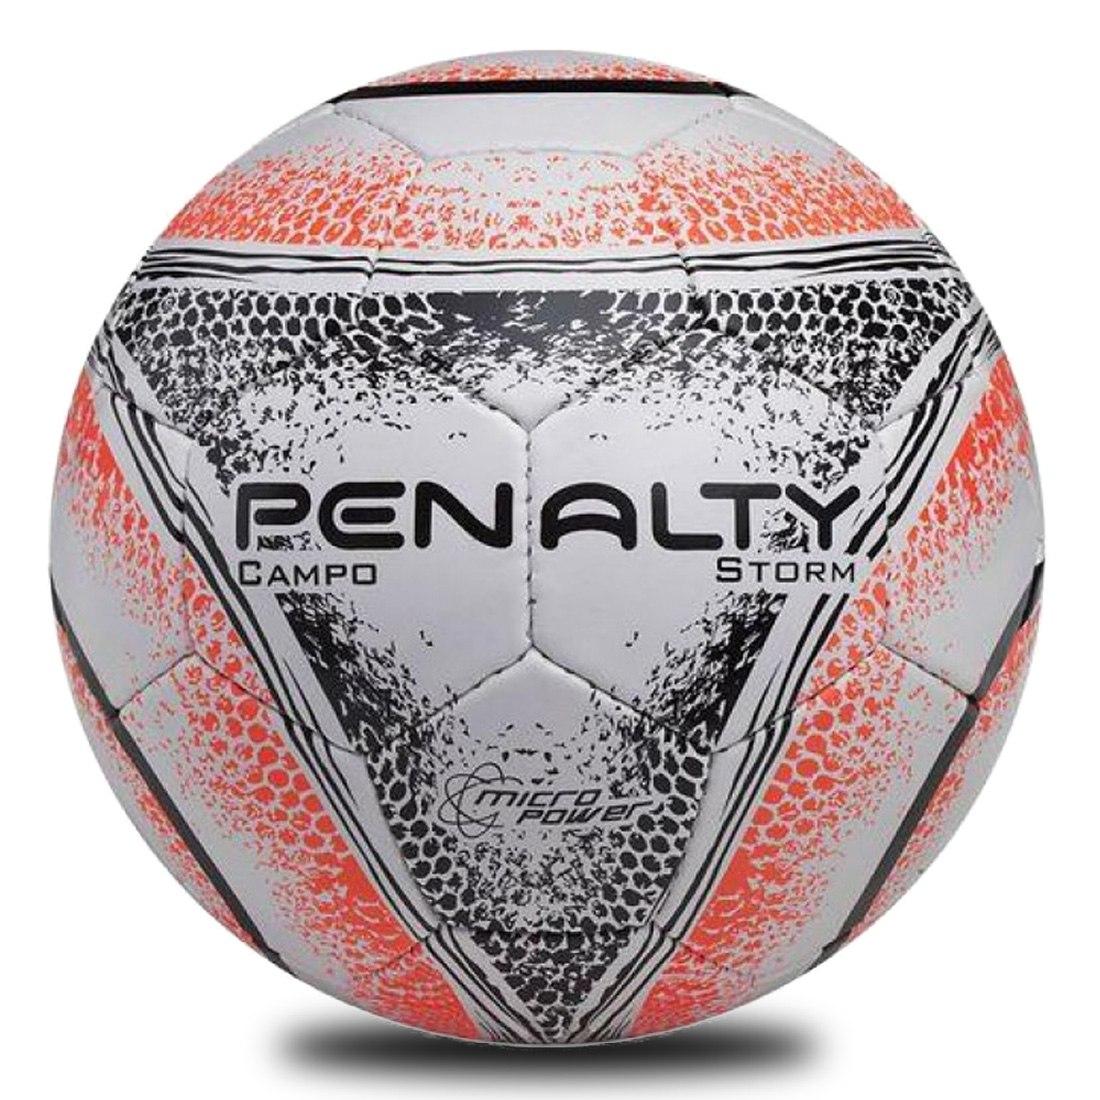 7ee057fb68 Bola Futebol Campo Penalty Storm Costurada - R  63